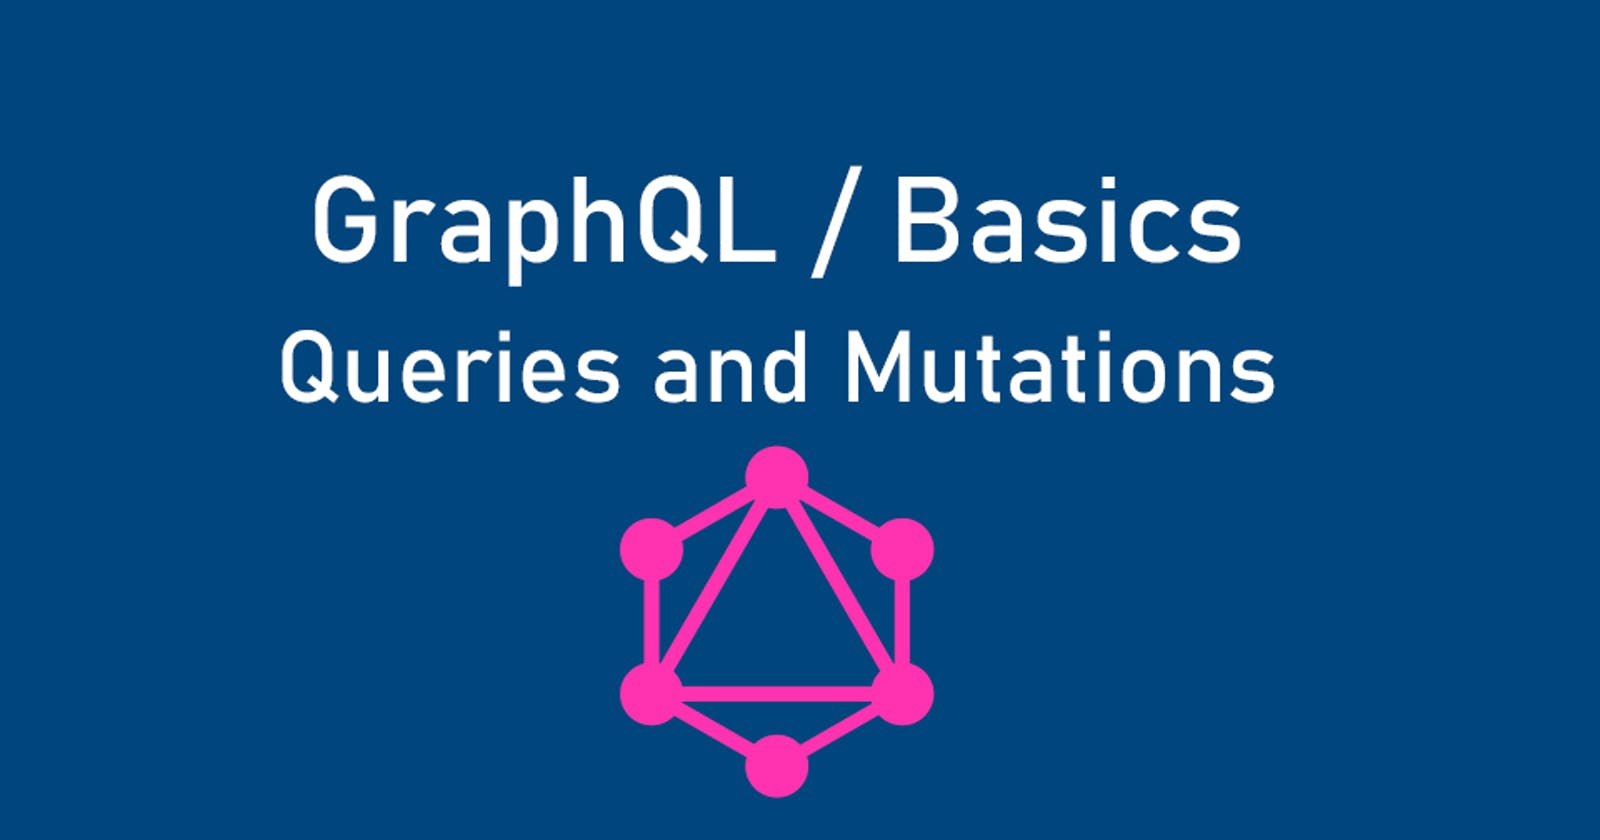 GraphQL basics. Part 1. Queries and mutations